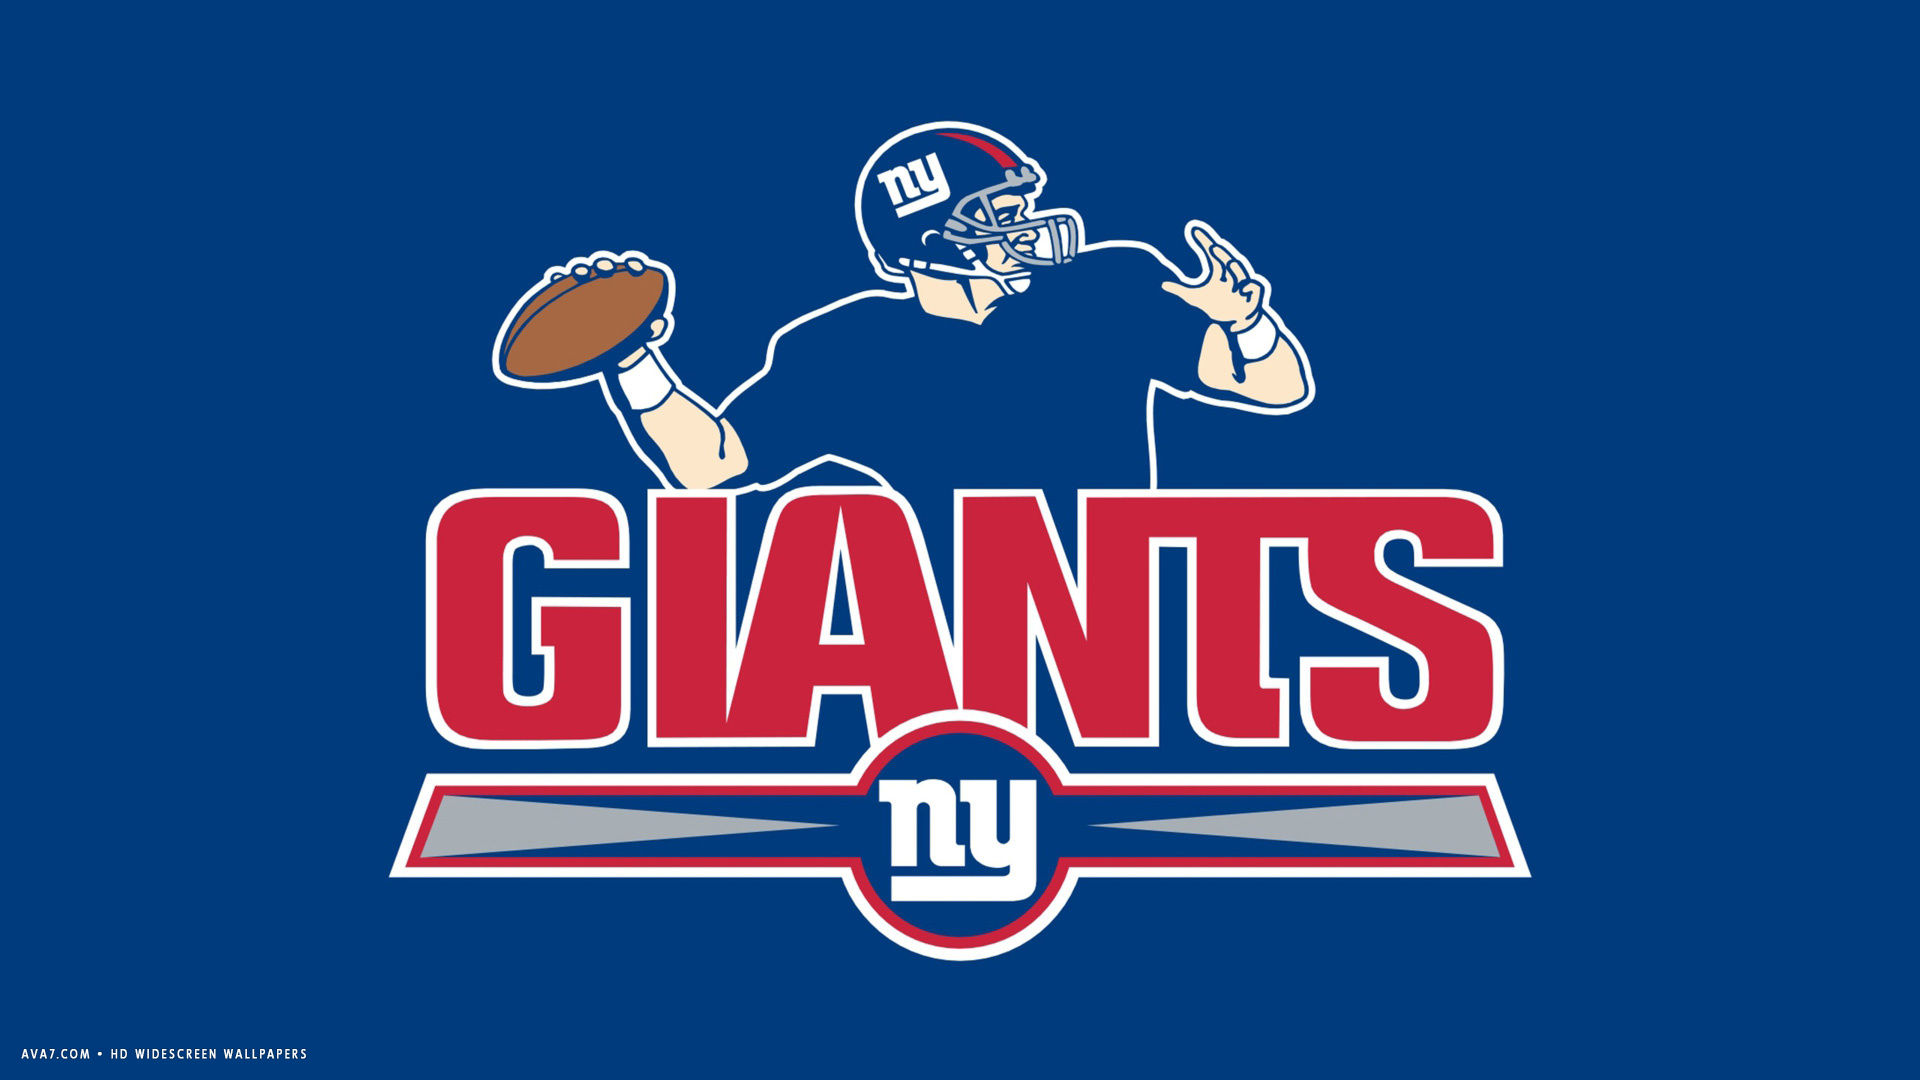 3d Wallpaper Ny Giants New York Giants Nfl Football Team Hd Widescreen Wallpaper